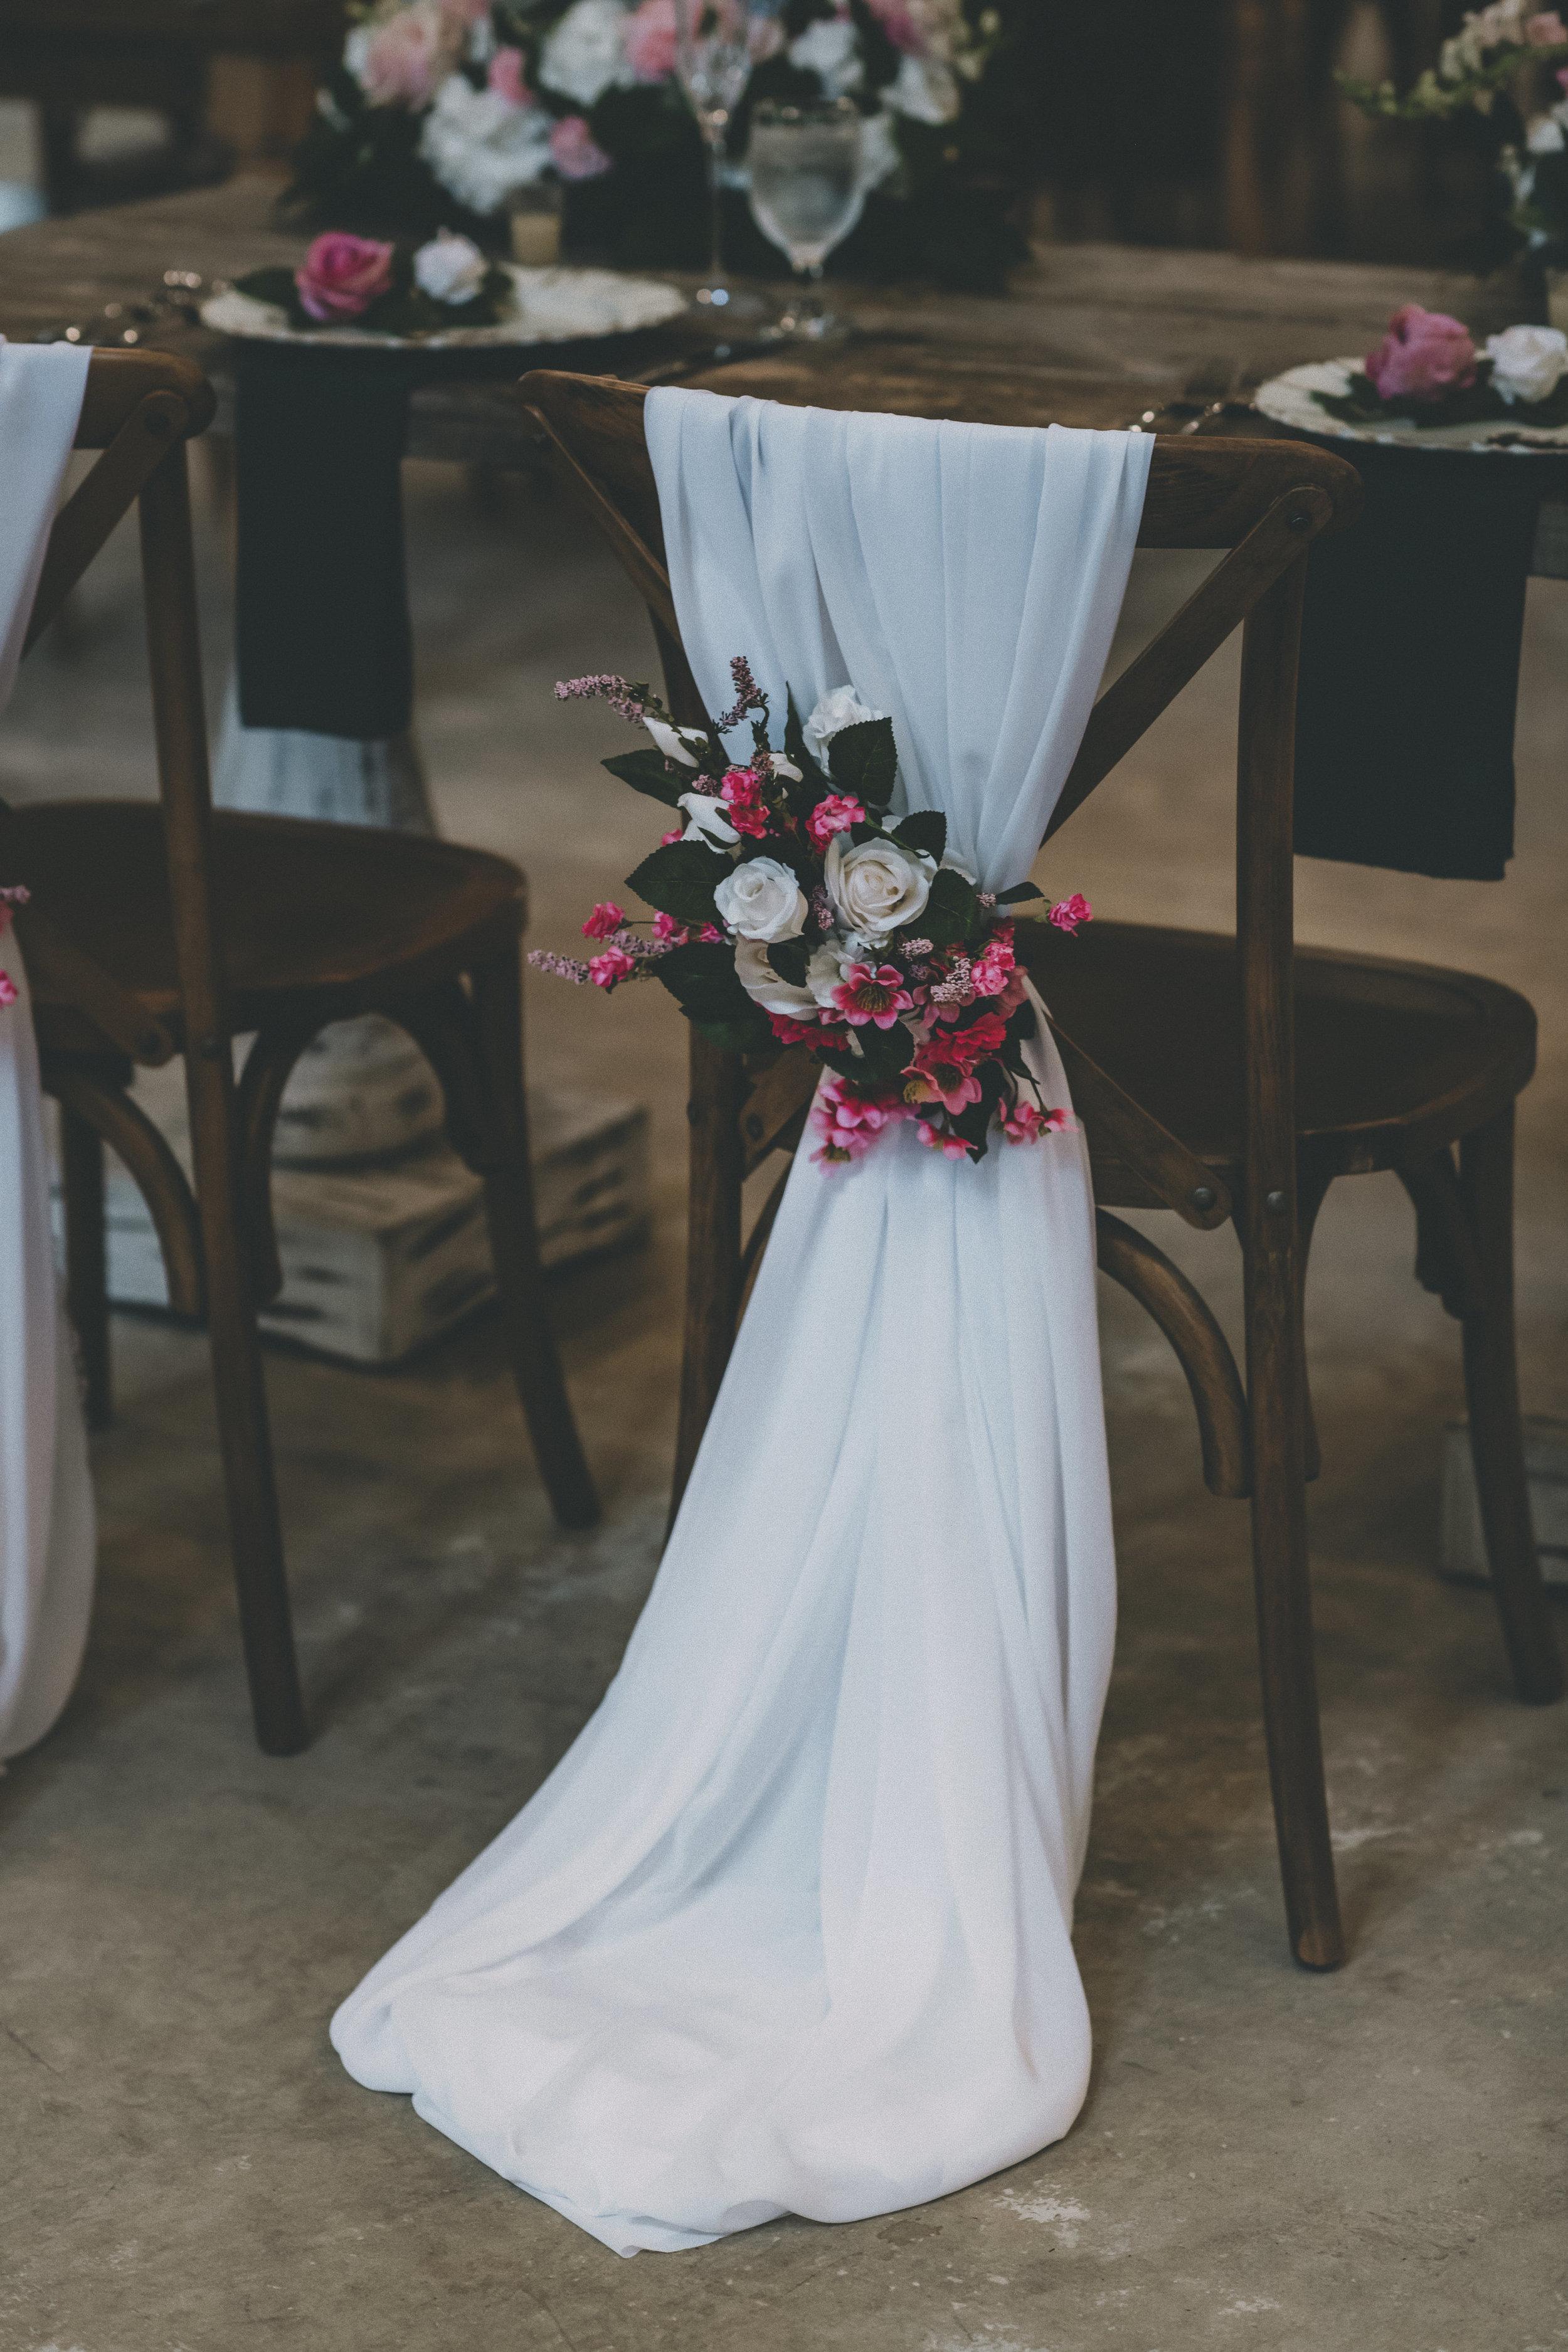 Rustic Vintage Chandler Oaks Barn Wedding - St. Augustine Florida Wedding Venue - The Overwhelmed Bride Wedding Blog